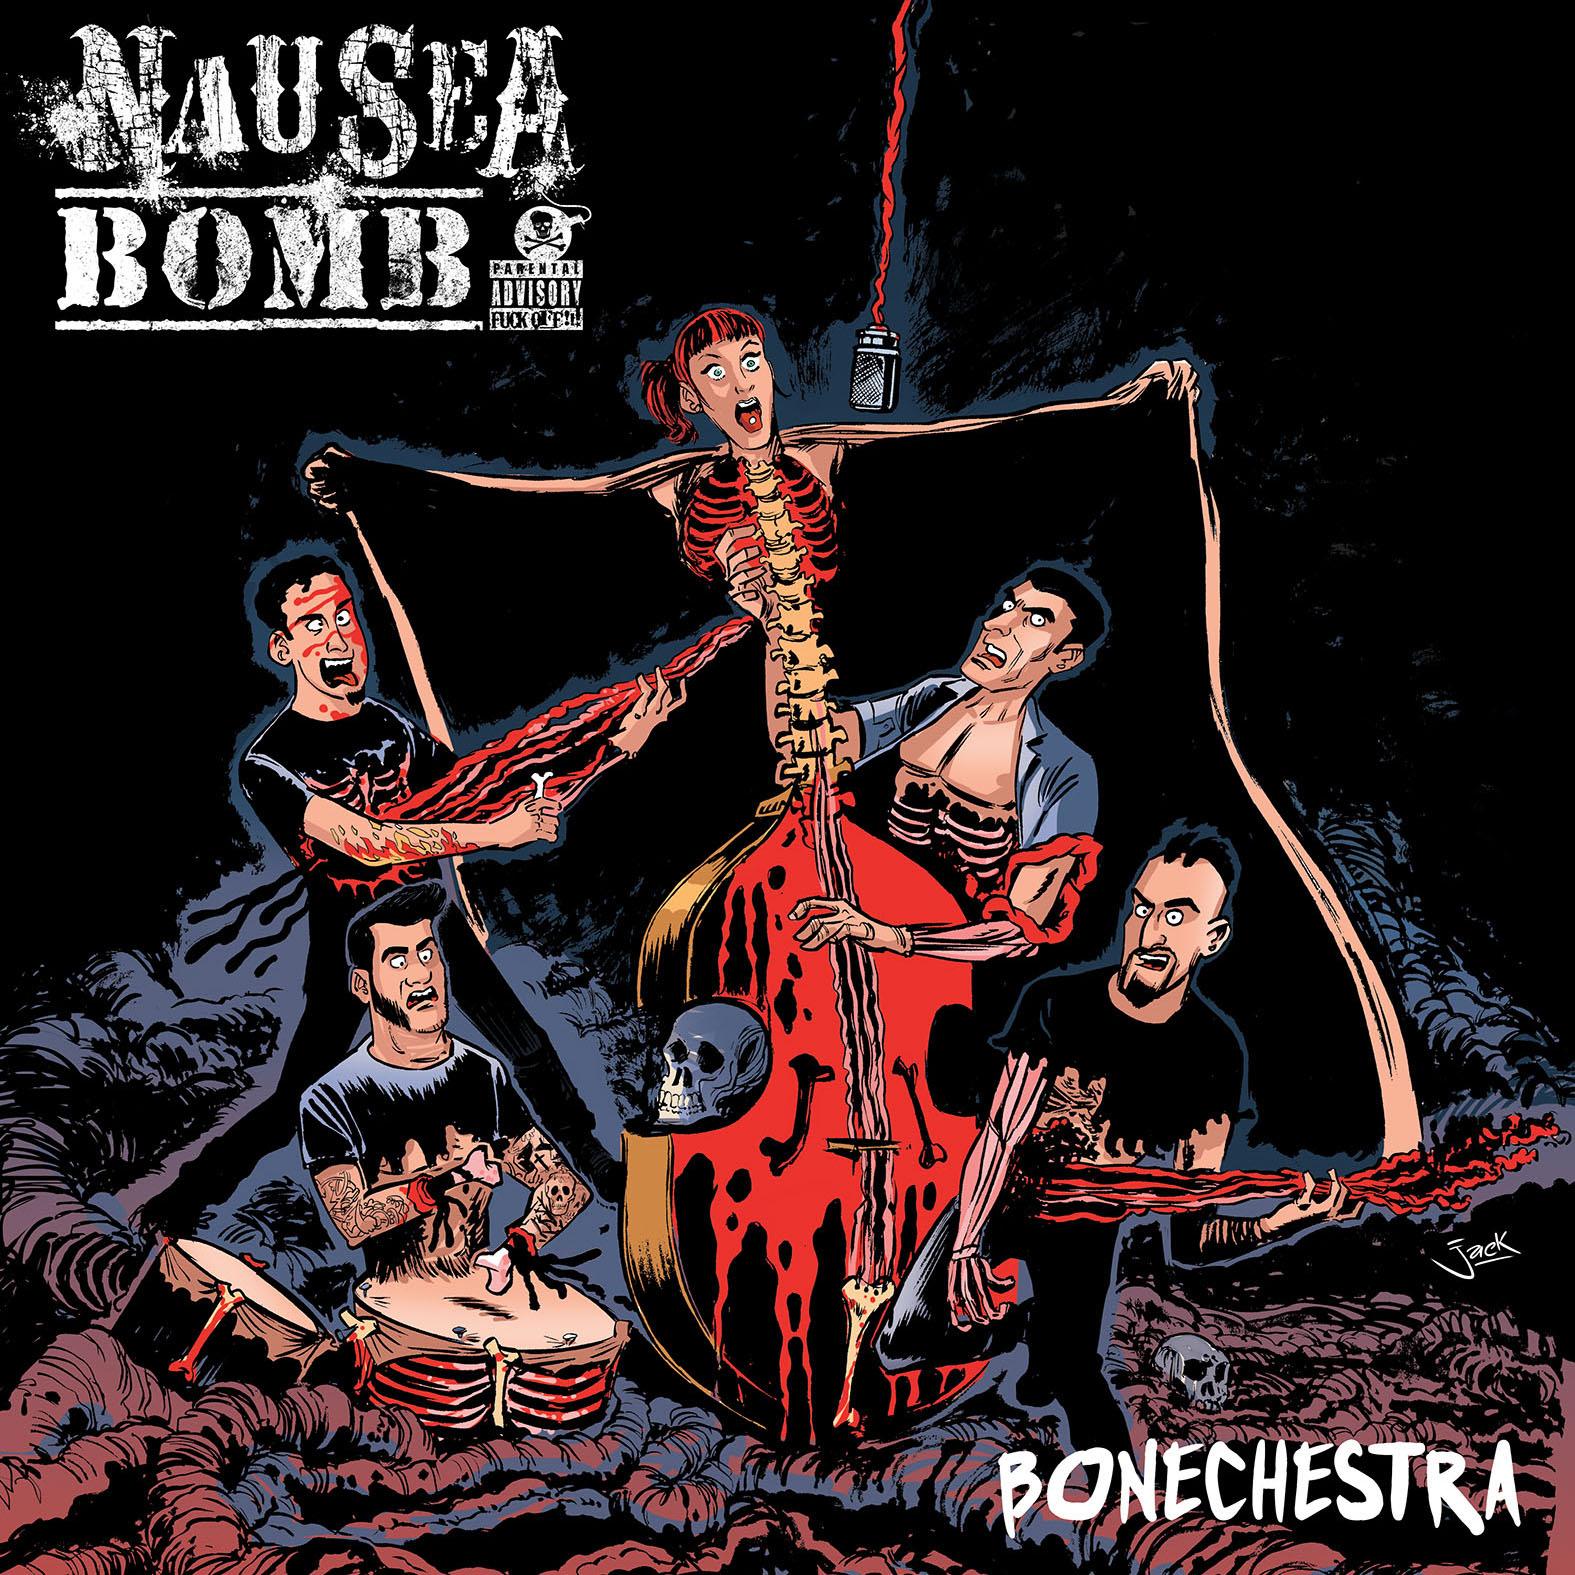 Nausea bomb